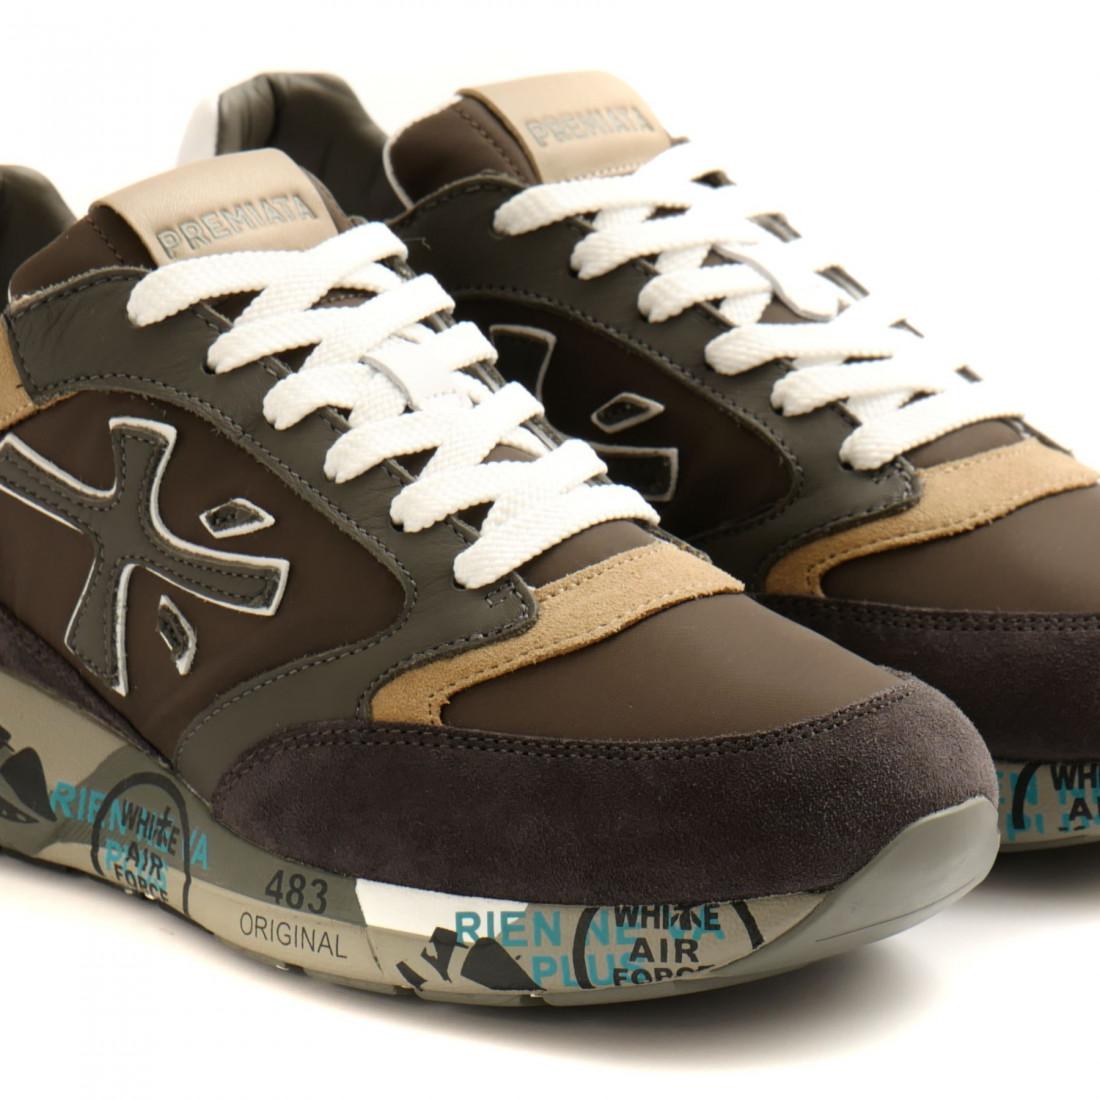 sneakers uomo premiata zaczac5368 8856